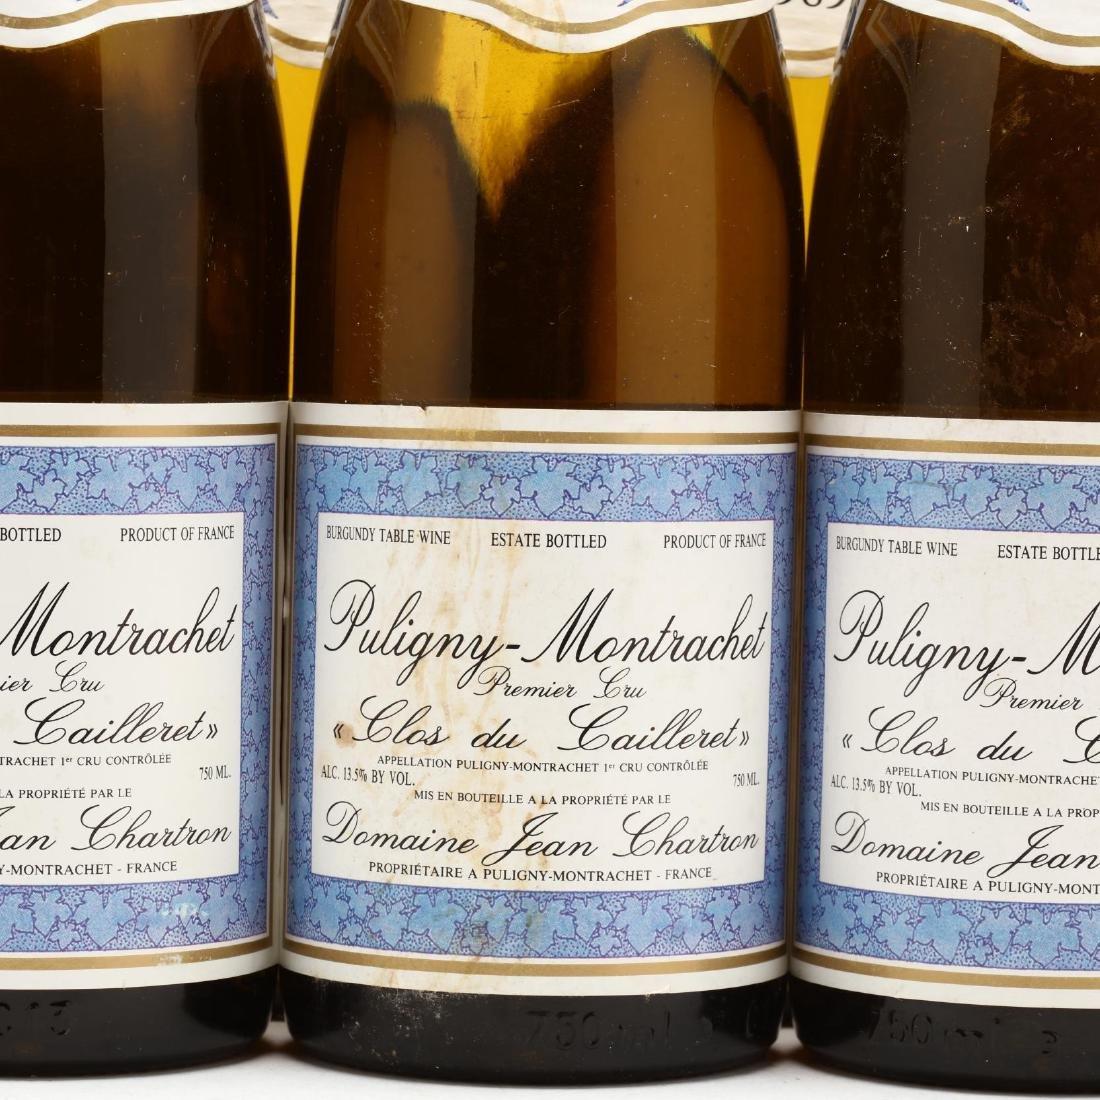 Puligny Montrachet - Vintage 1989 - 2